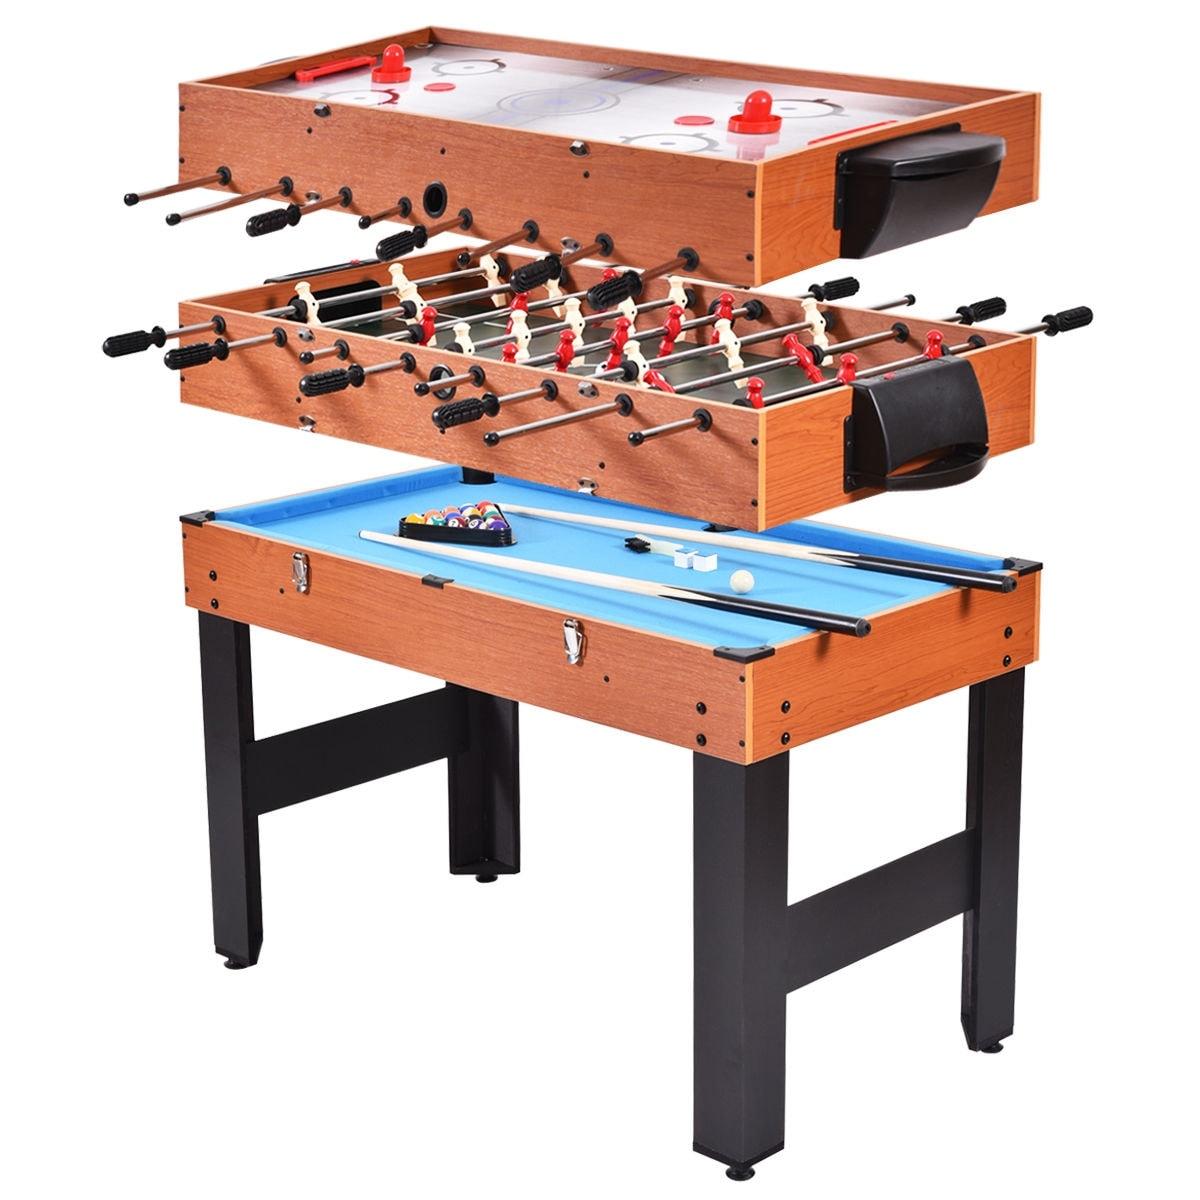 Costway 48u0027u0027 3 In 1 Multi Combo Game Table Foosball Soccer Billiards